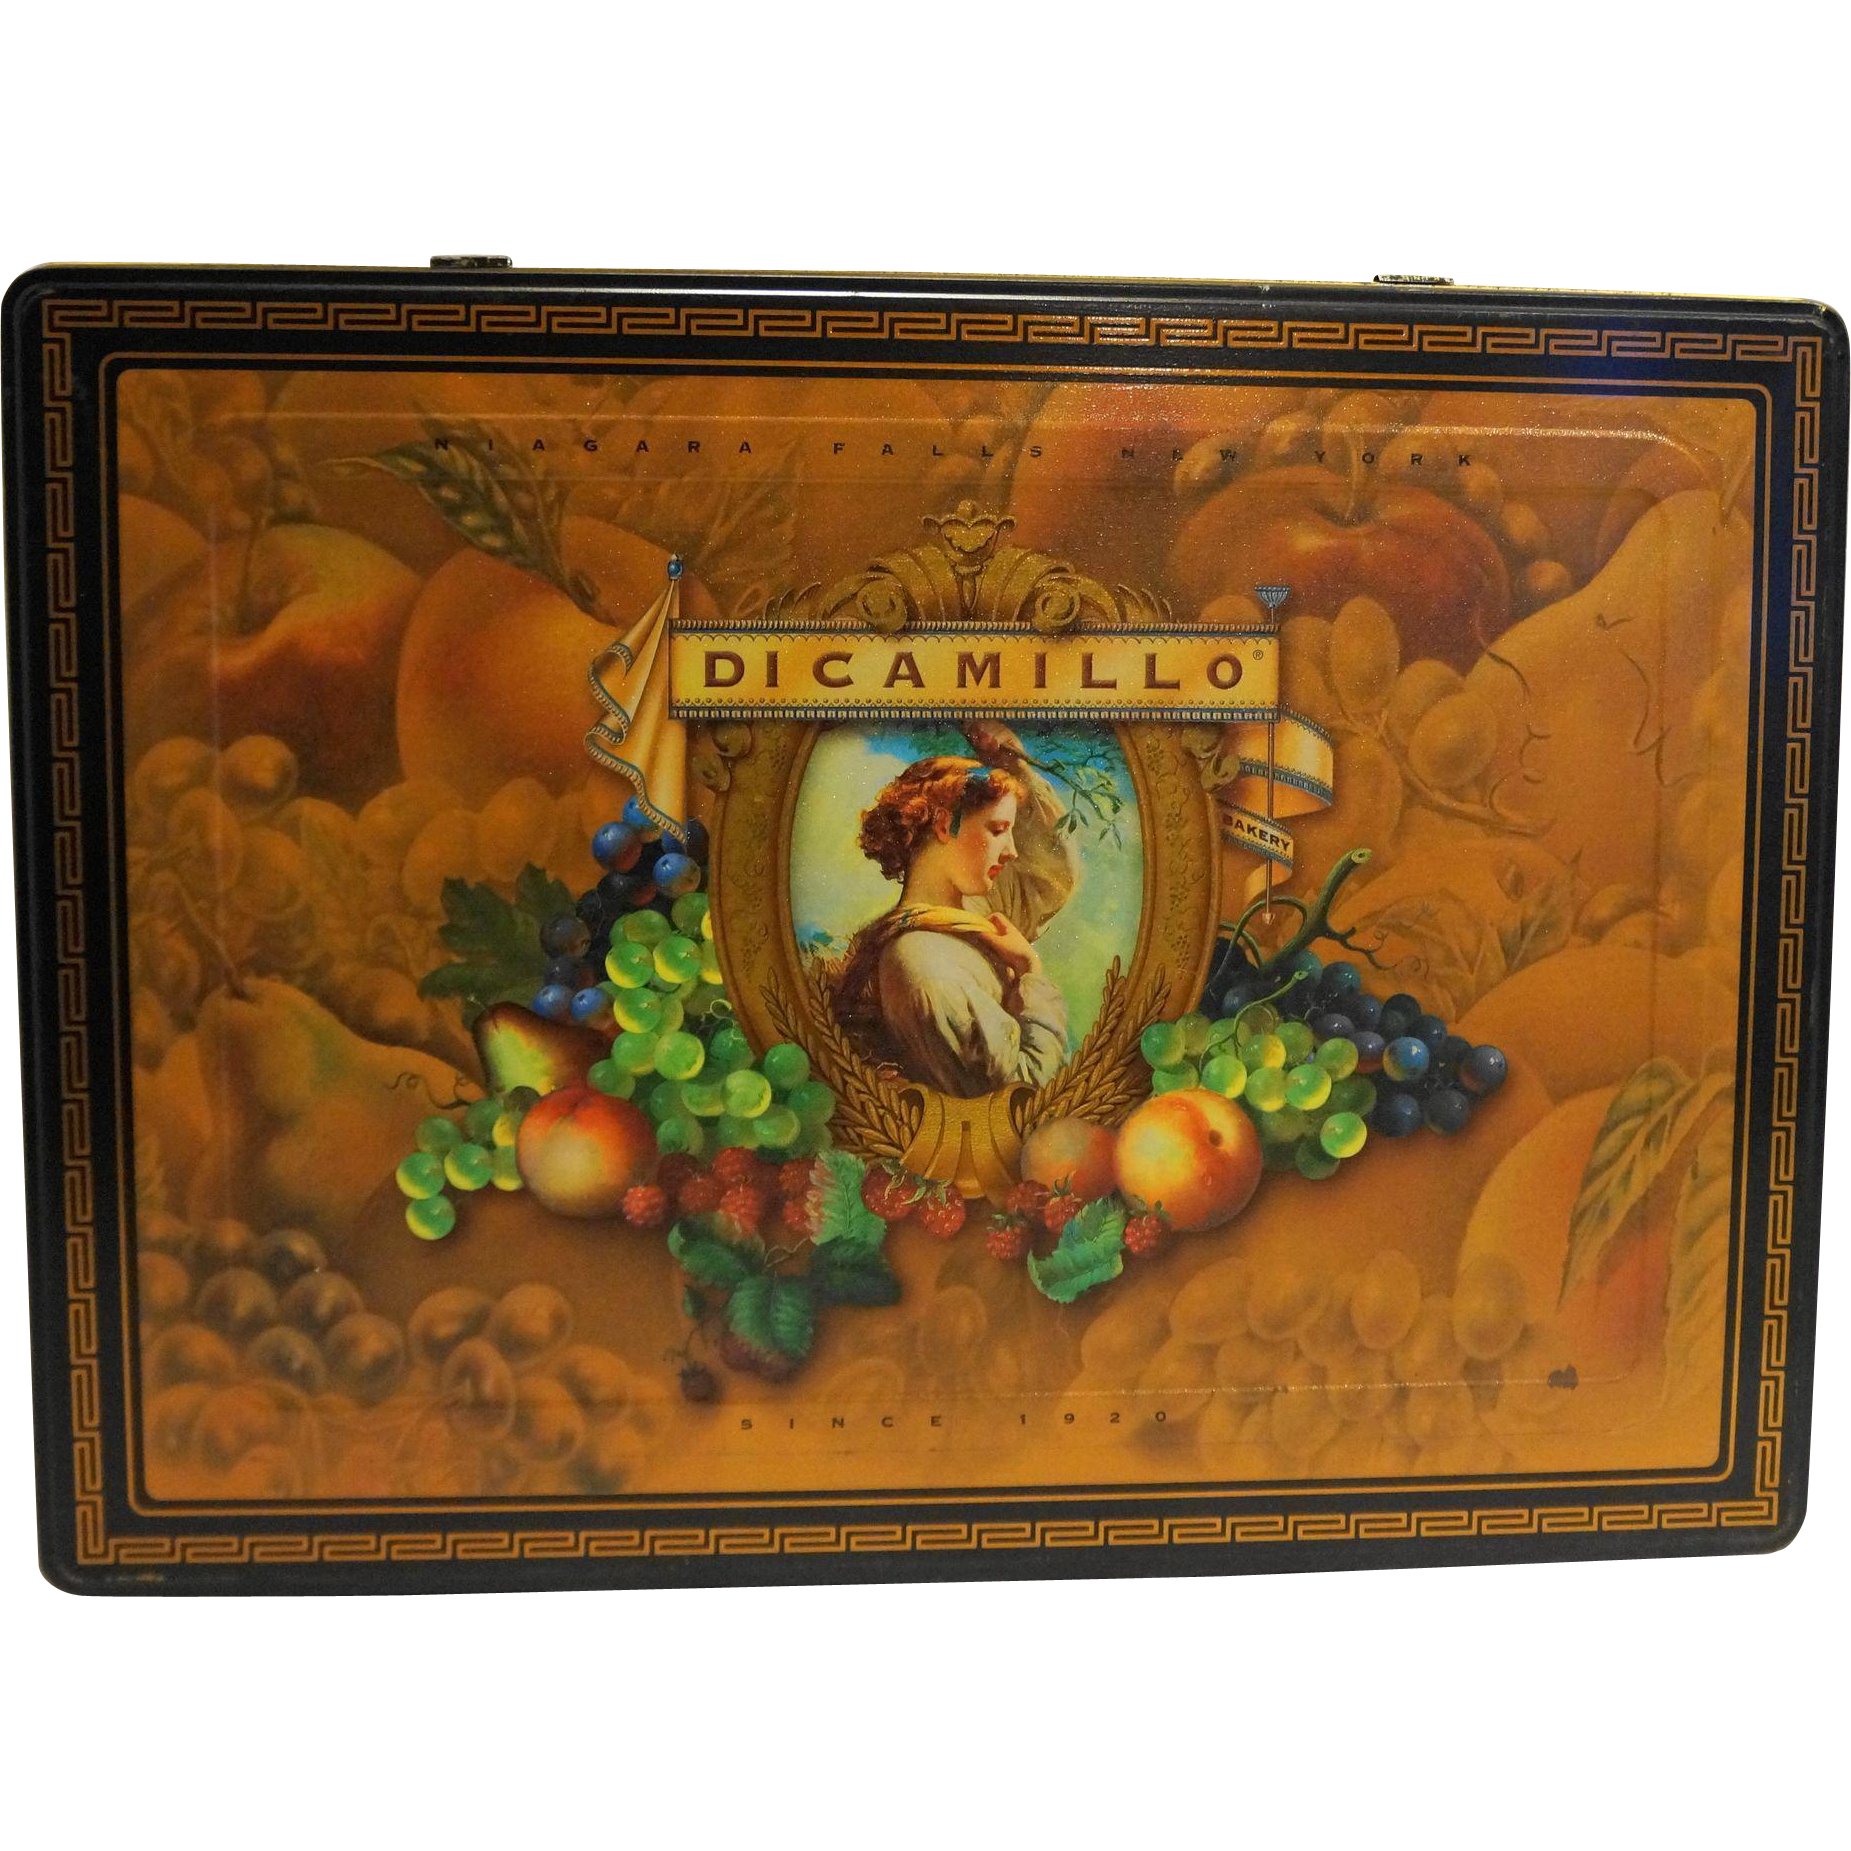 DiCamillo Bakery Niagara Falls Large Cookie Tin Fruit Portrait Black Gold Greek key